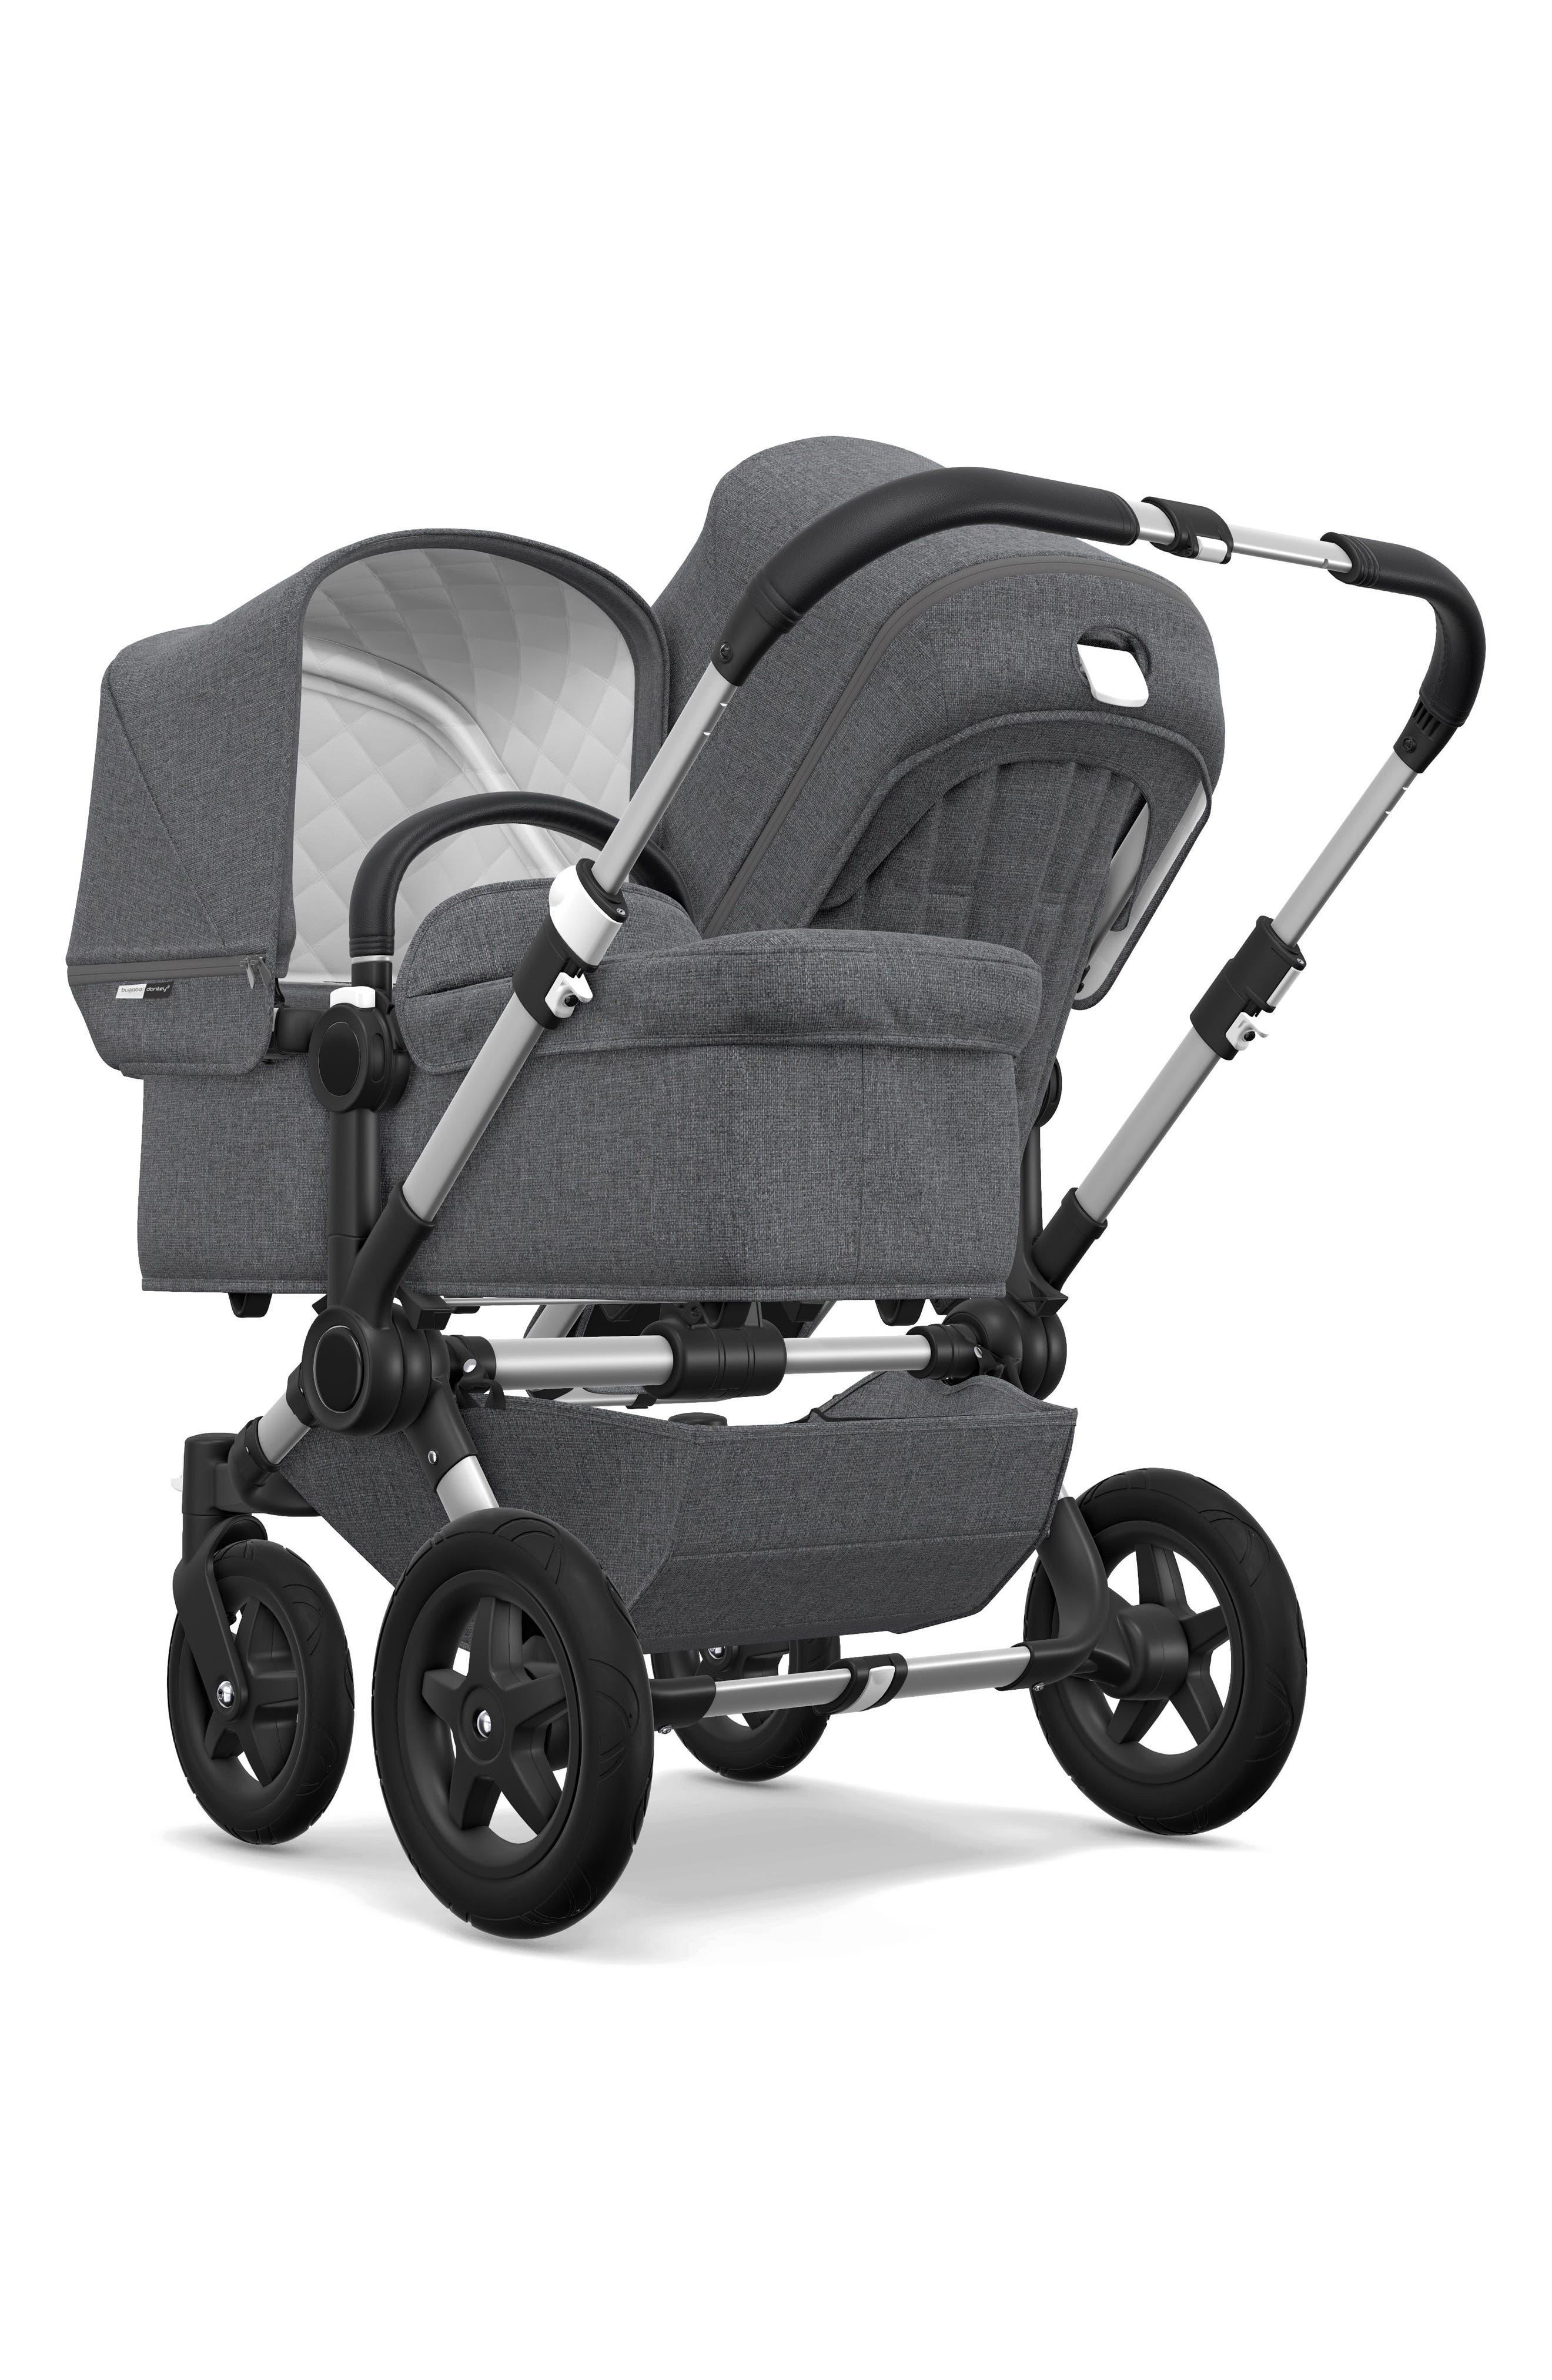 BUGABOO,                             Frame Seat Extension for Donkey2 Stroller,                             Alternate thumbnail 3, color,                             GREY MELANGE/ ALUMINUM